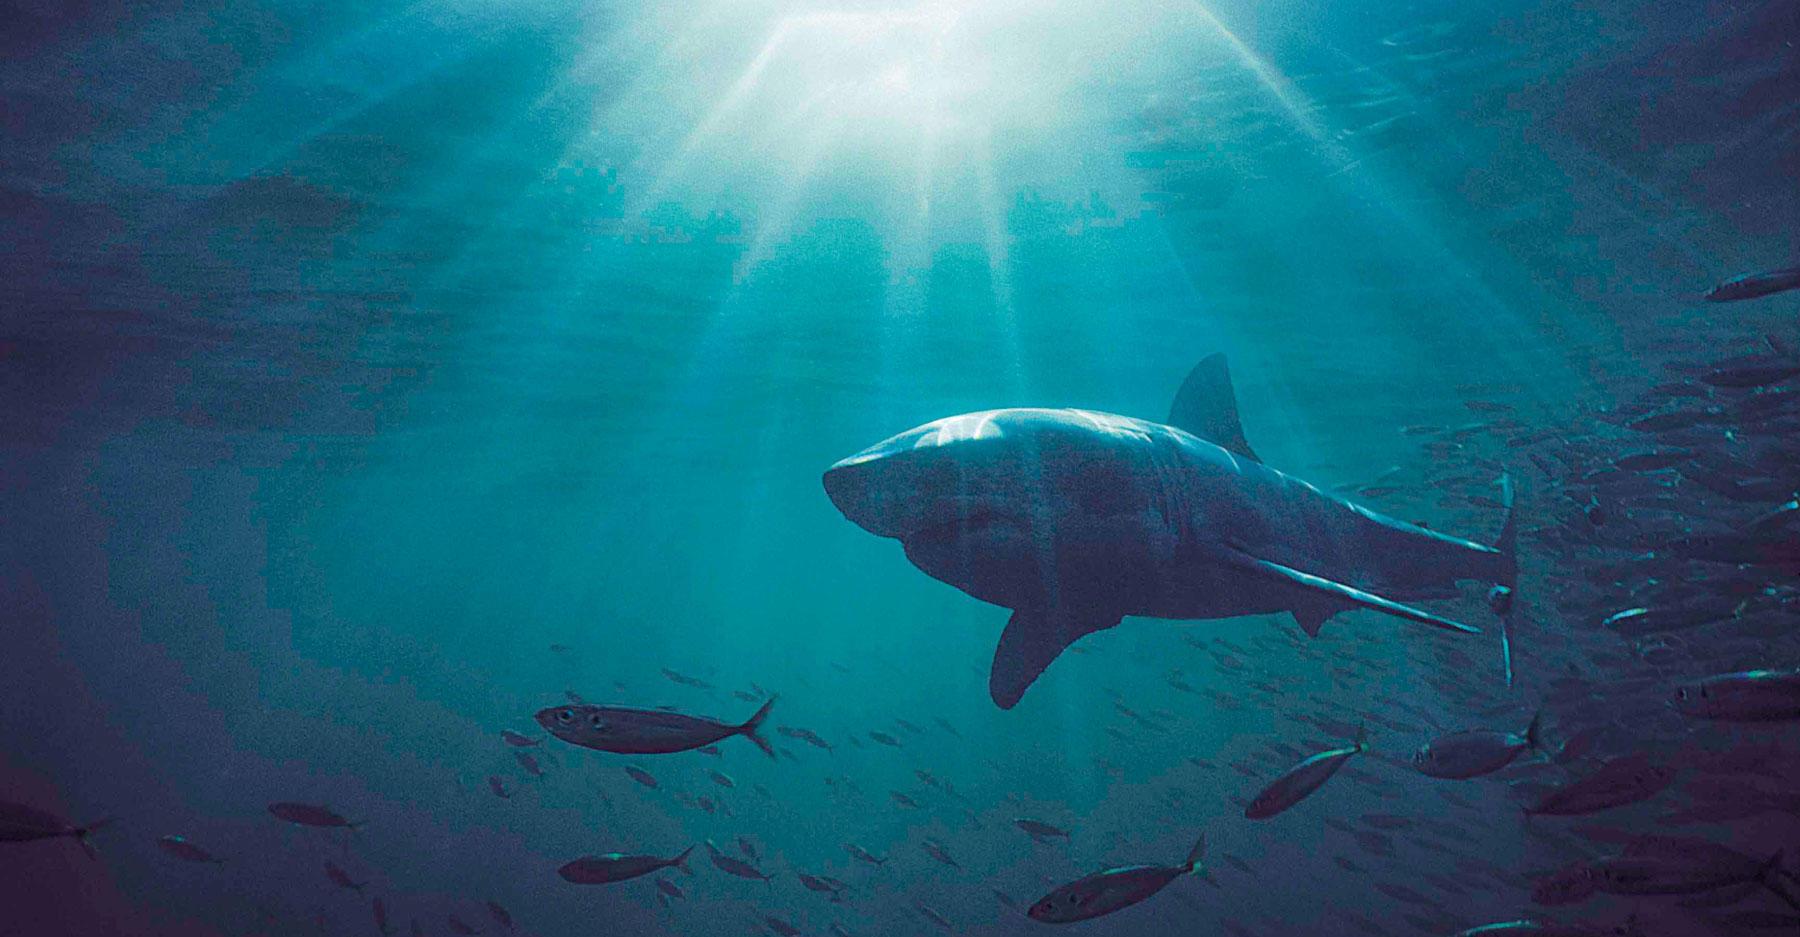 Great white shark in sunbeam